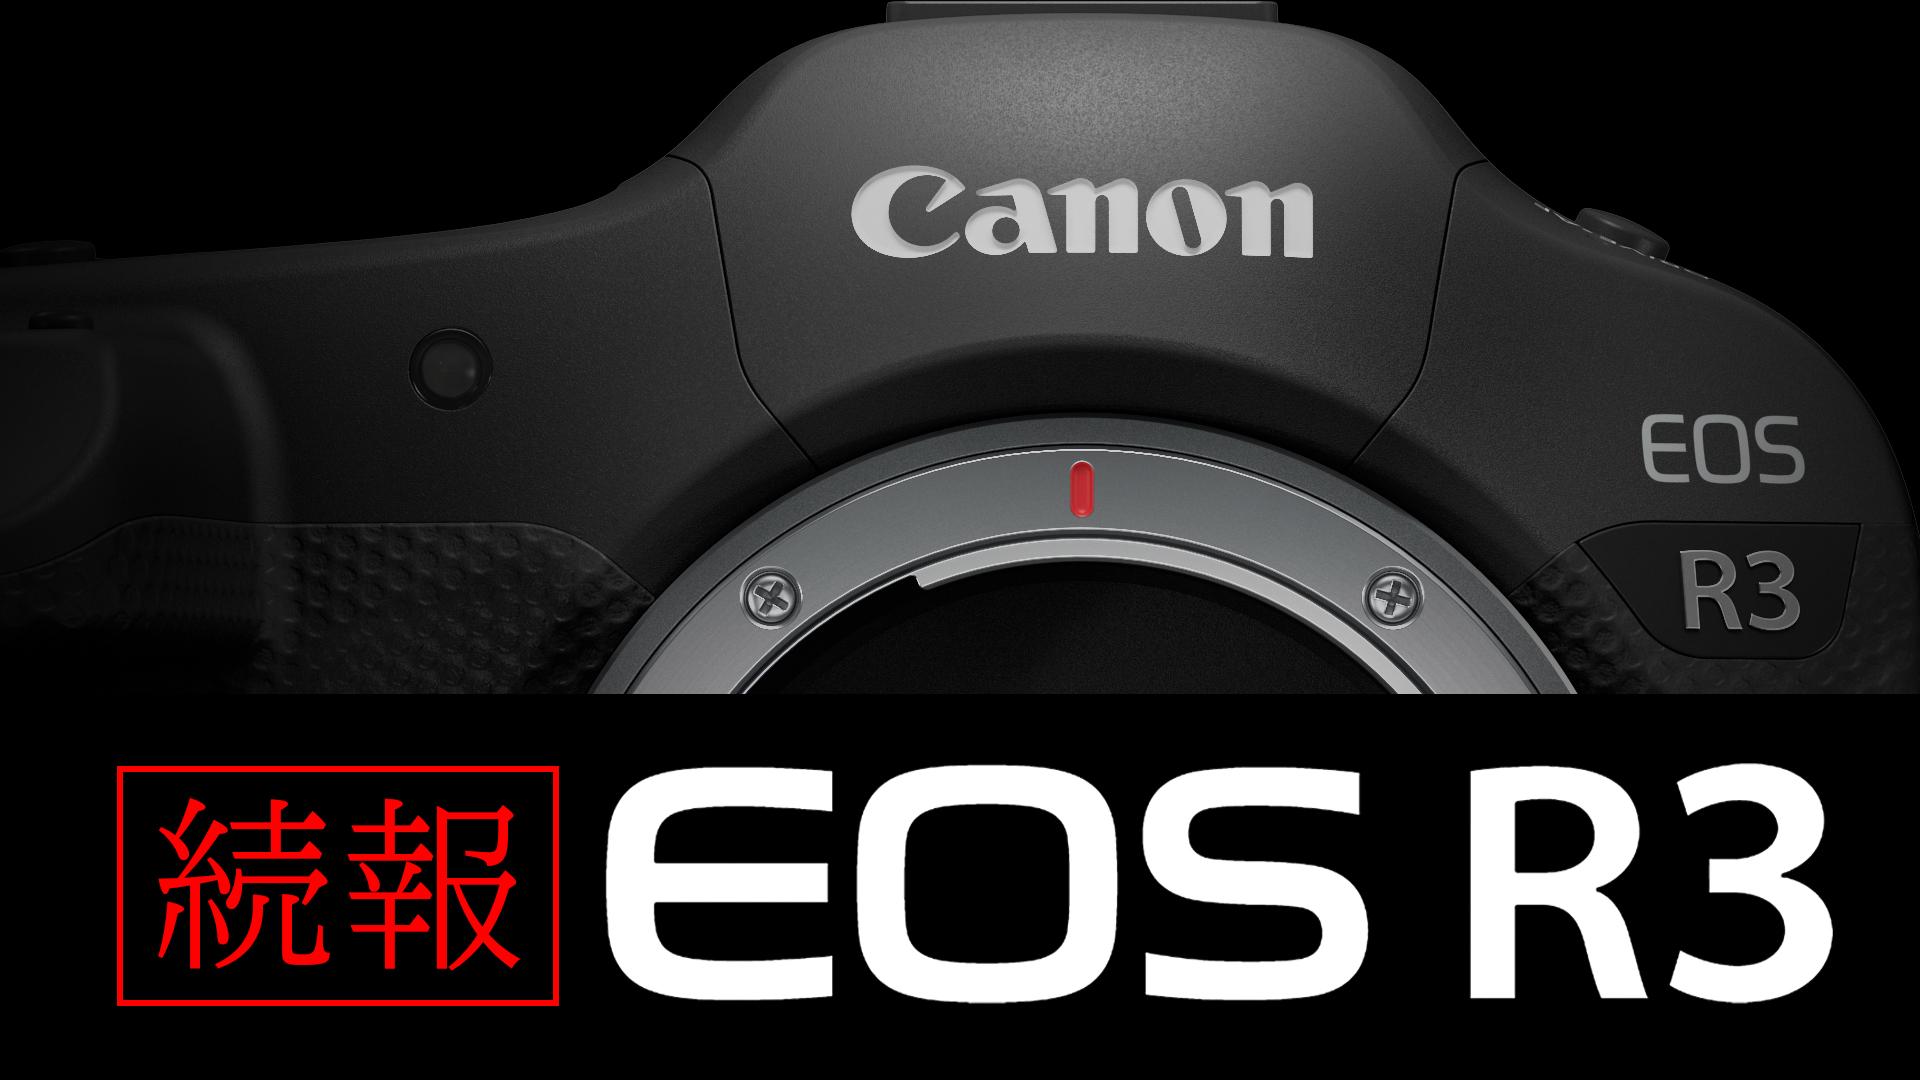 【Canon】続報『EOS R3』詳細スペック追加